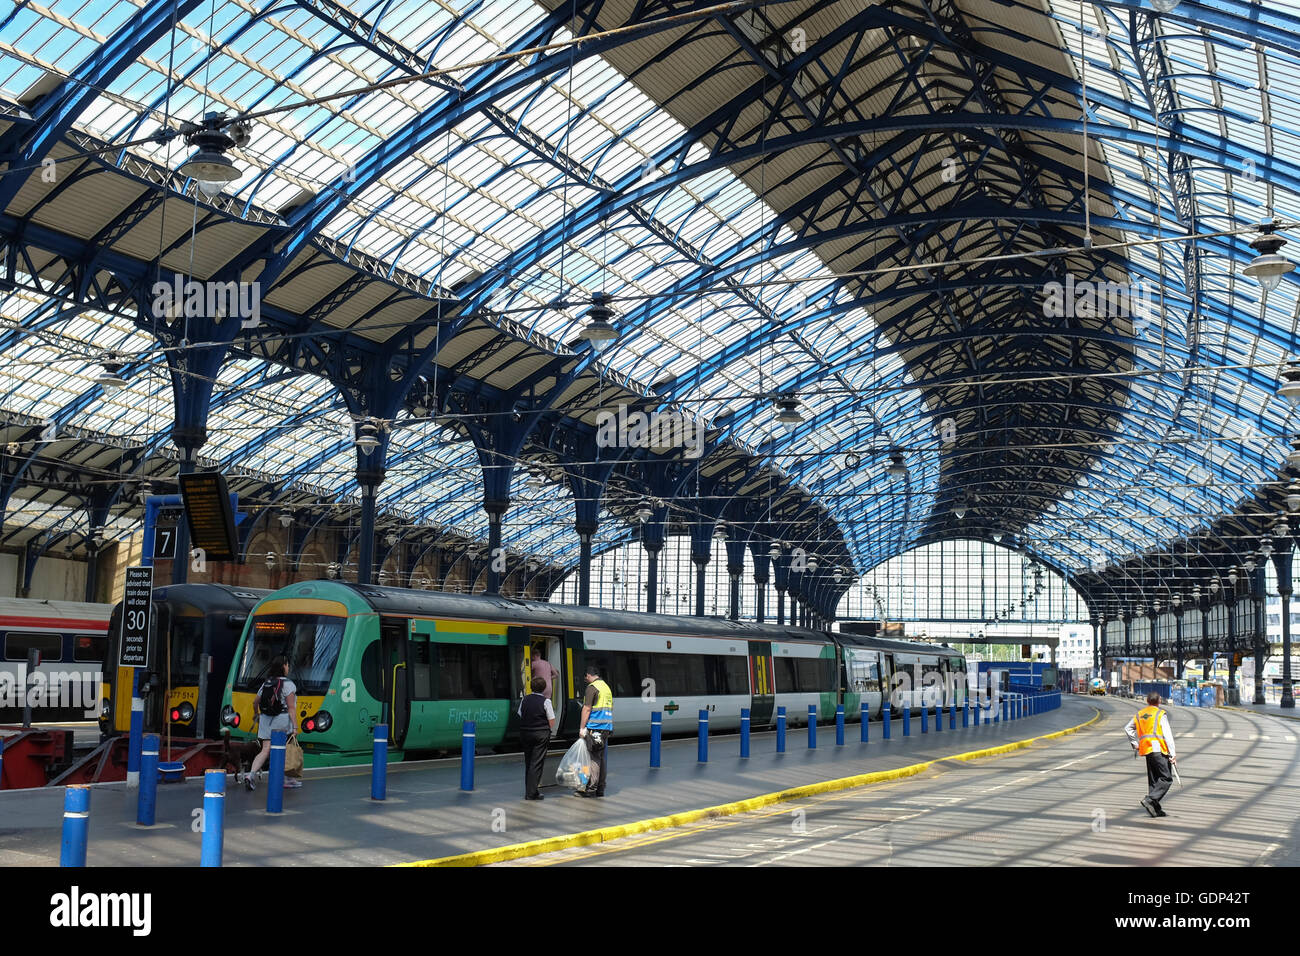 Brighton train station on the south coast of England. - Stock Image